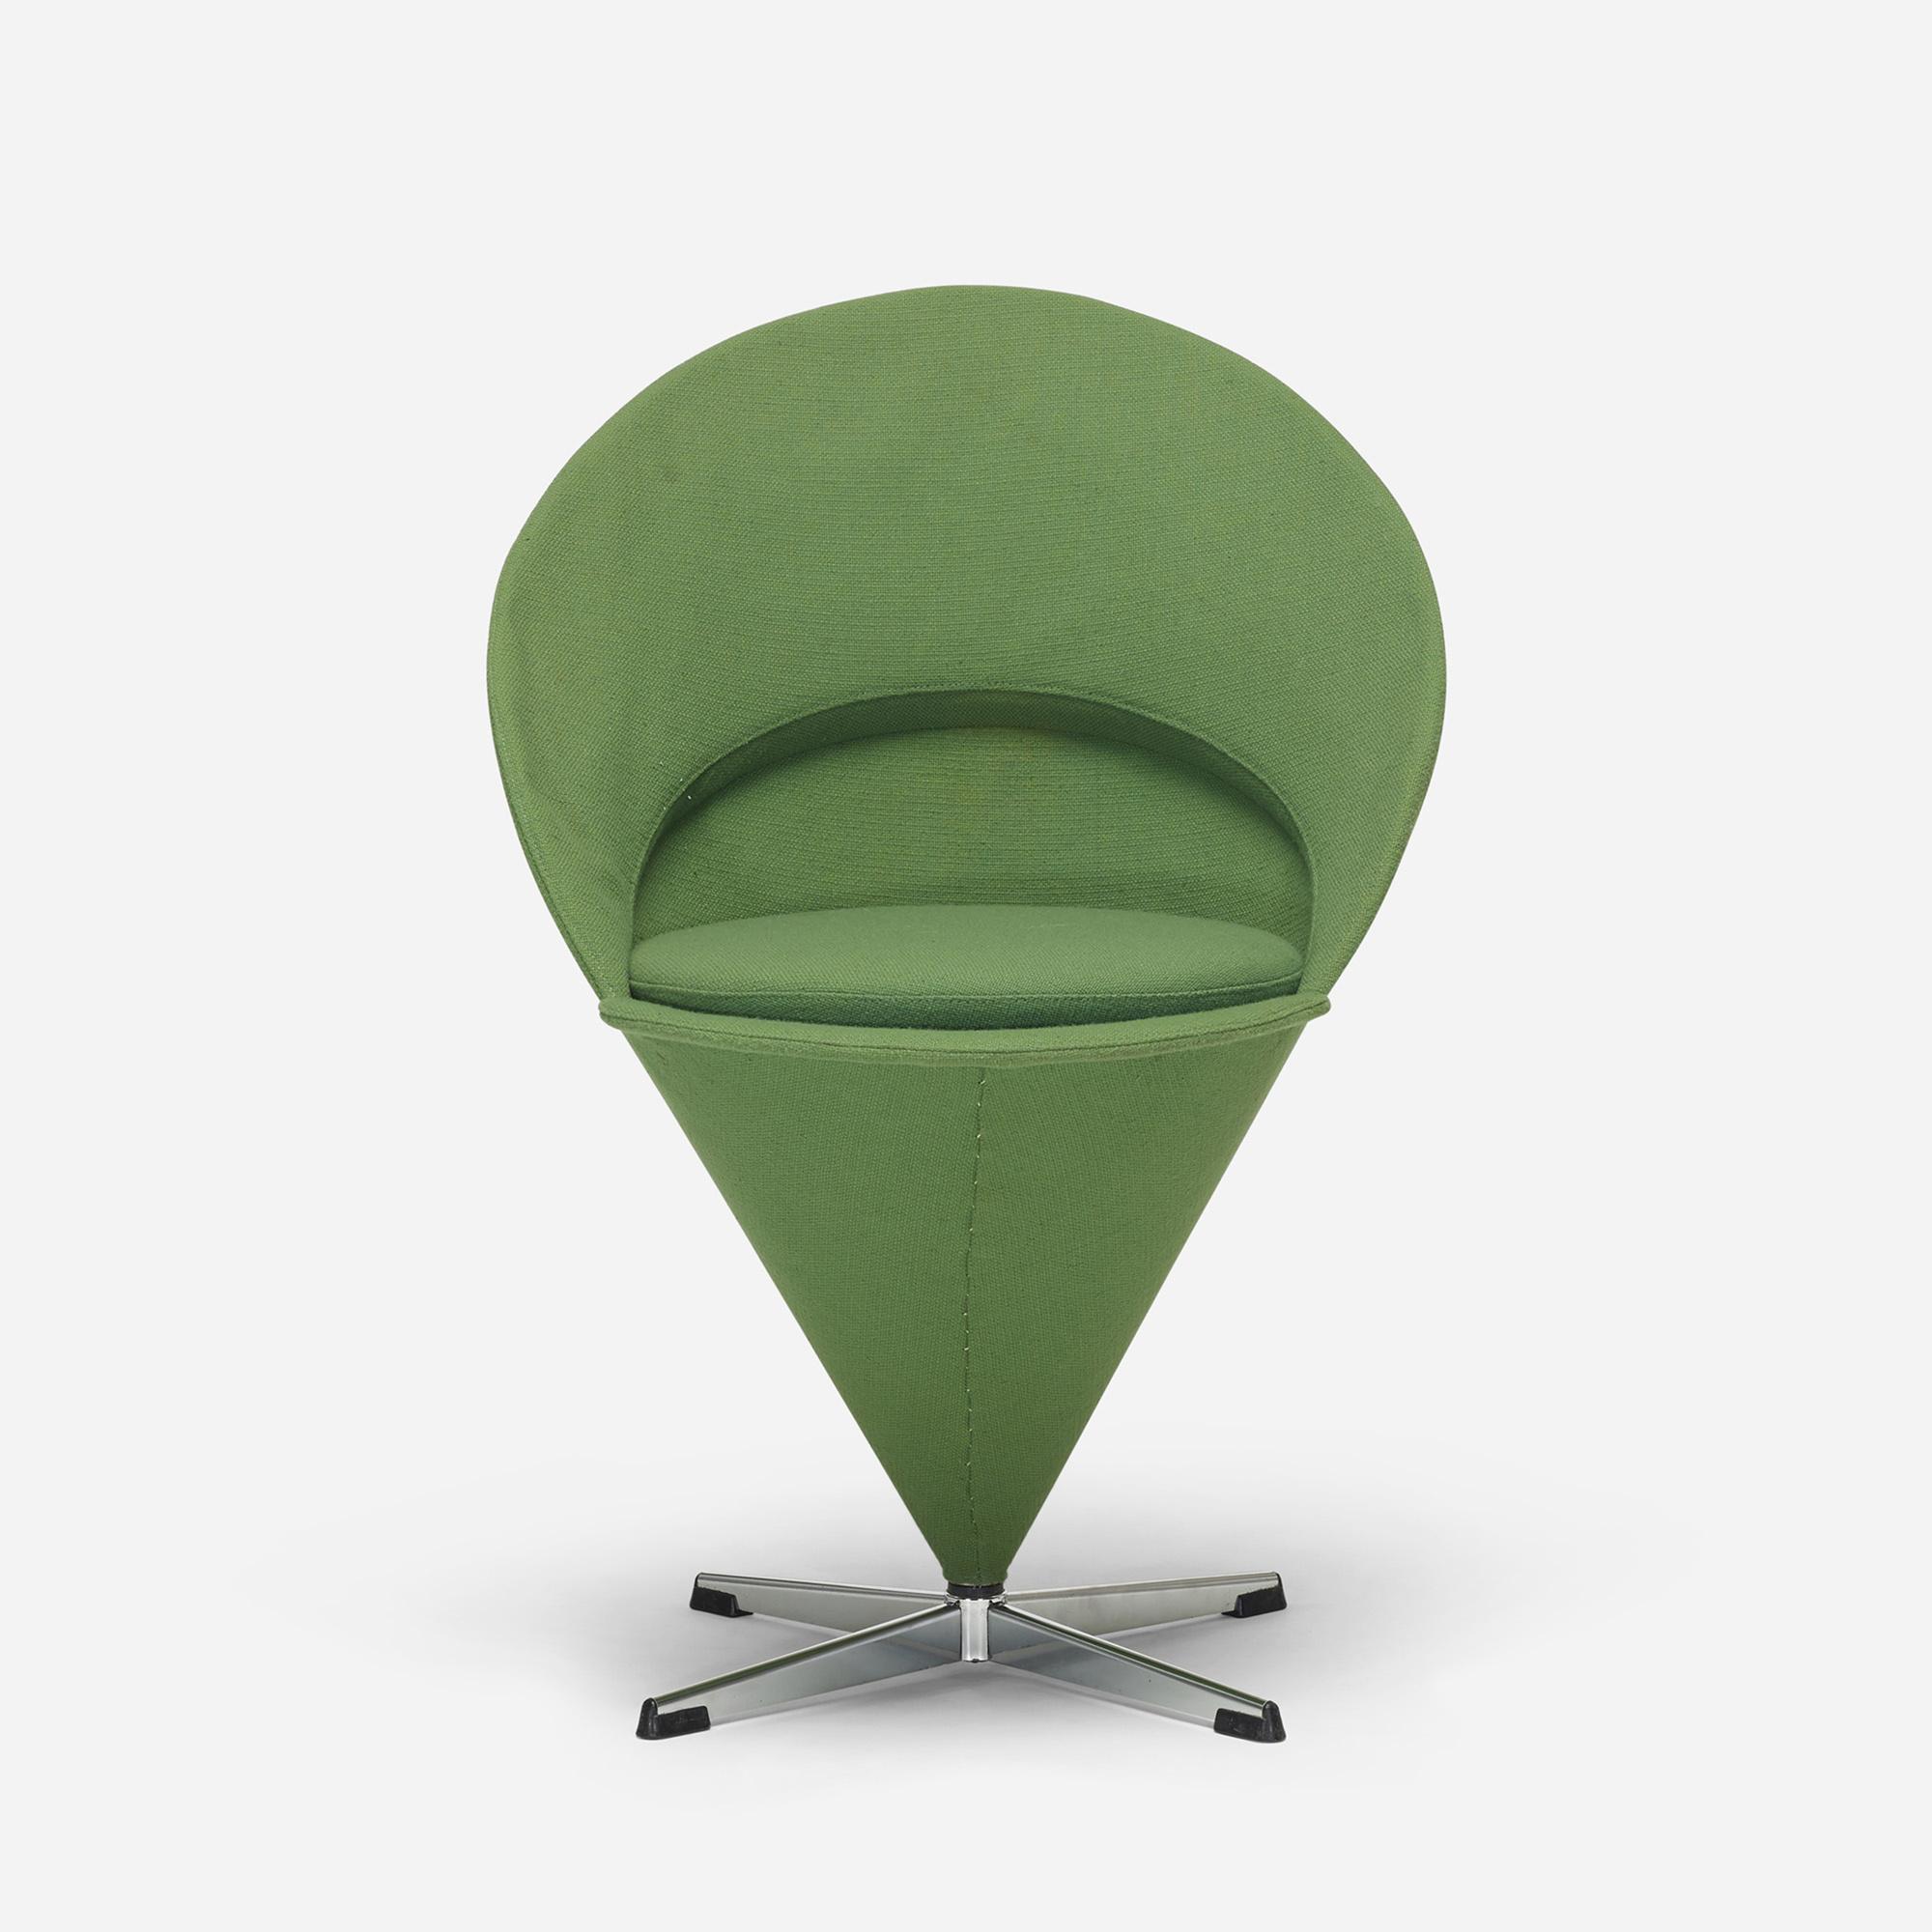 649: Verner Panton / Cone chair (1 of 4)